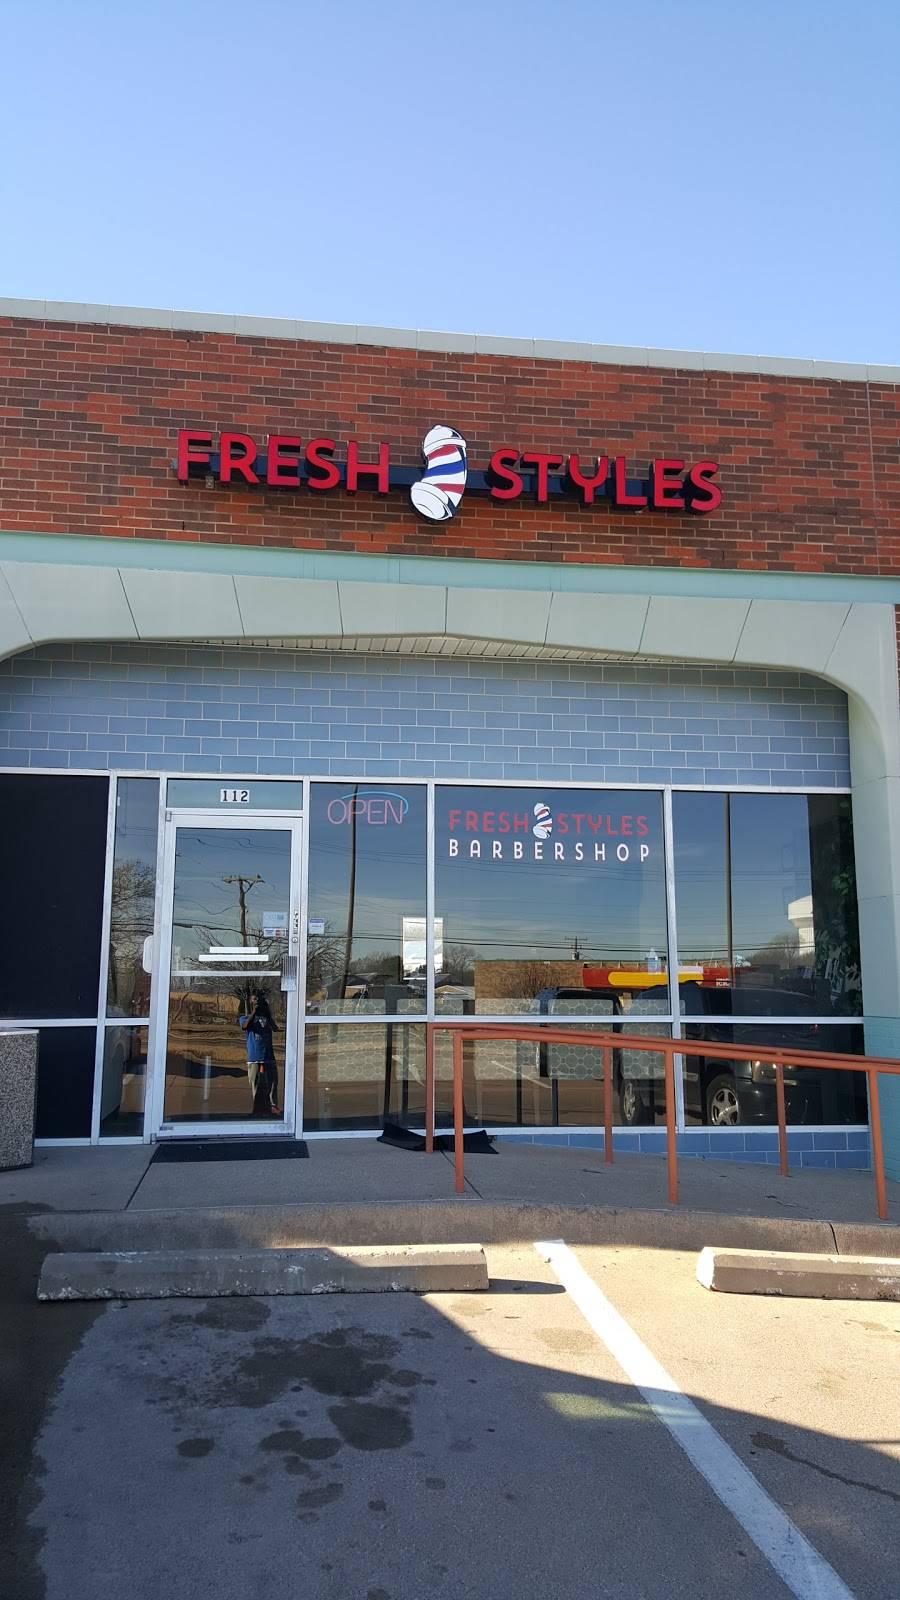 Fresh Styles Barbershop - hair care  | Photo 2 of 8 | Address: 3200 S Cooper St, Arlington, TX 76015, USA | Phone: (817) 468-3990